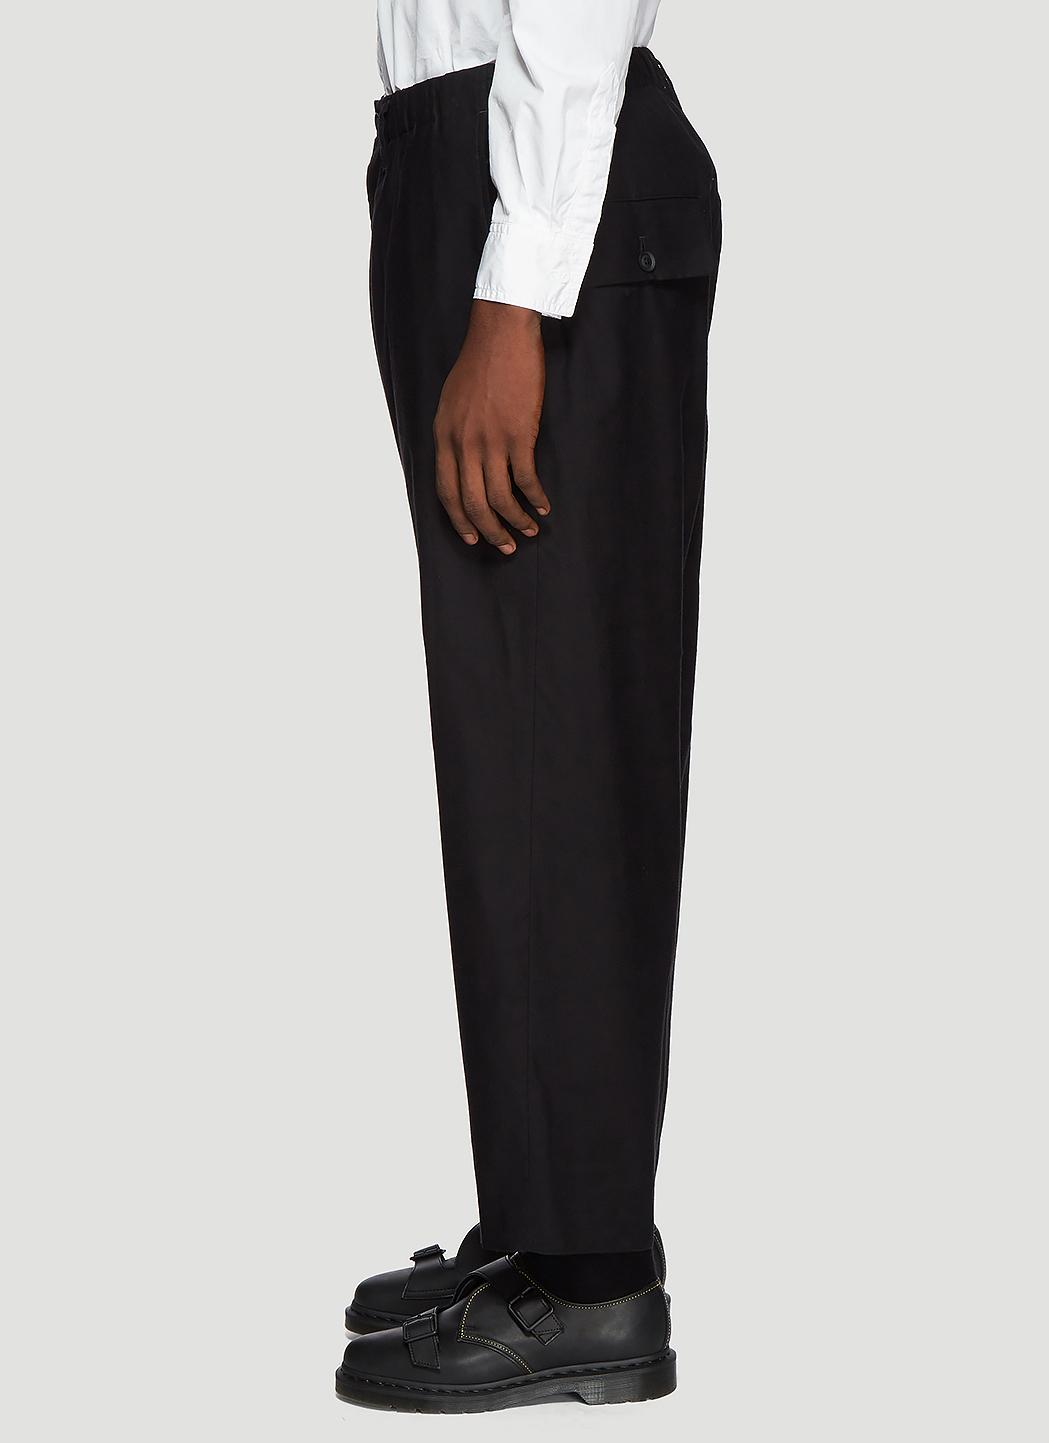 898eff62570 Yohji Yamamoto - Wide Leg Pants In Black for Men - Lyst. View fullscreen